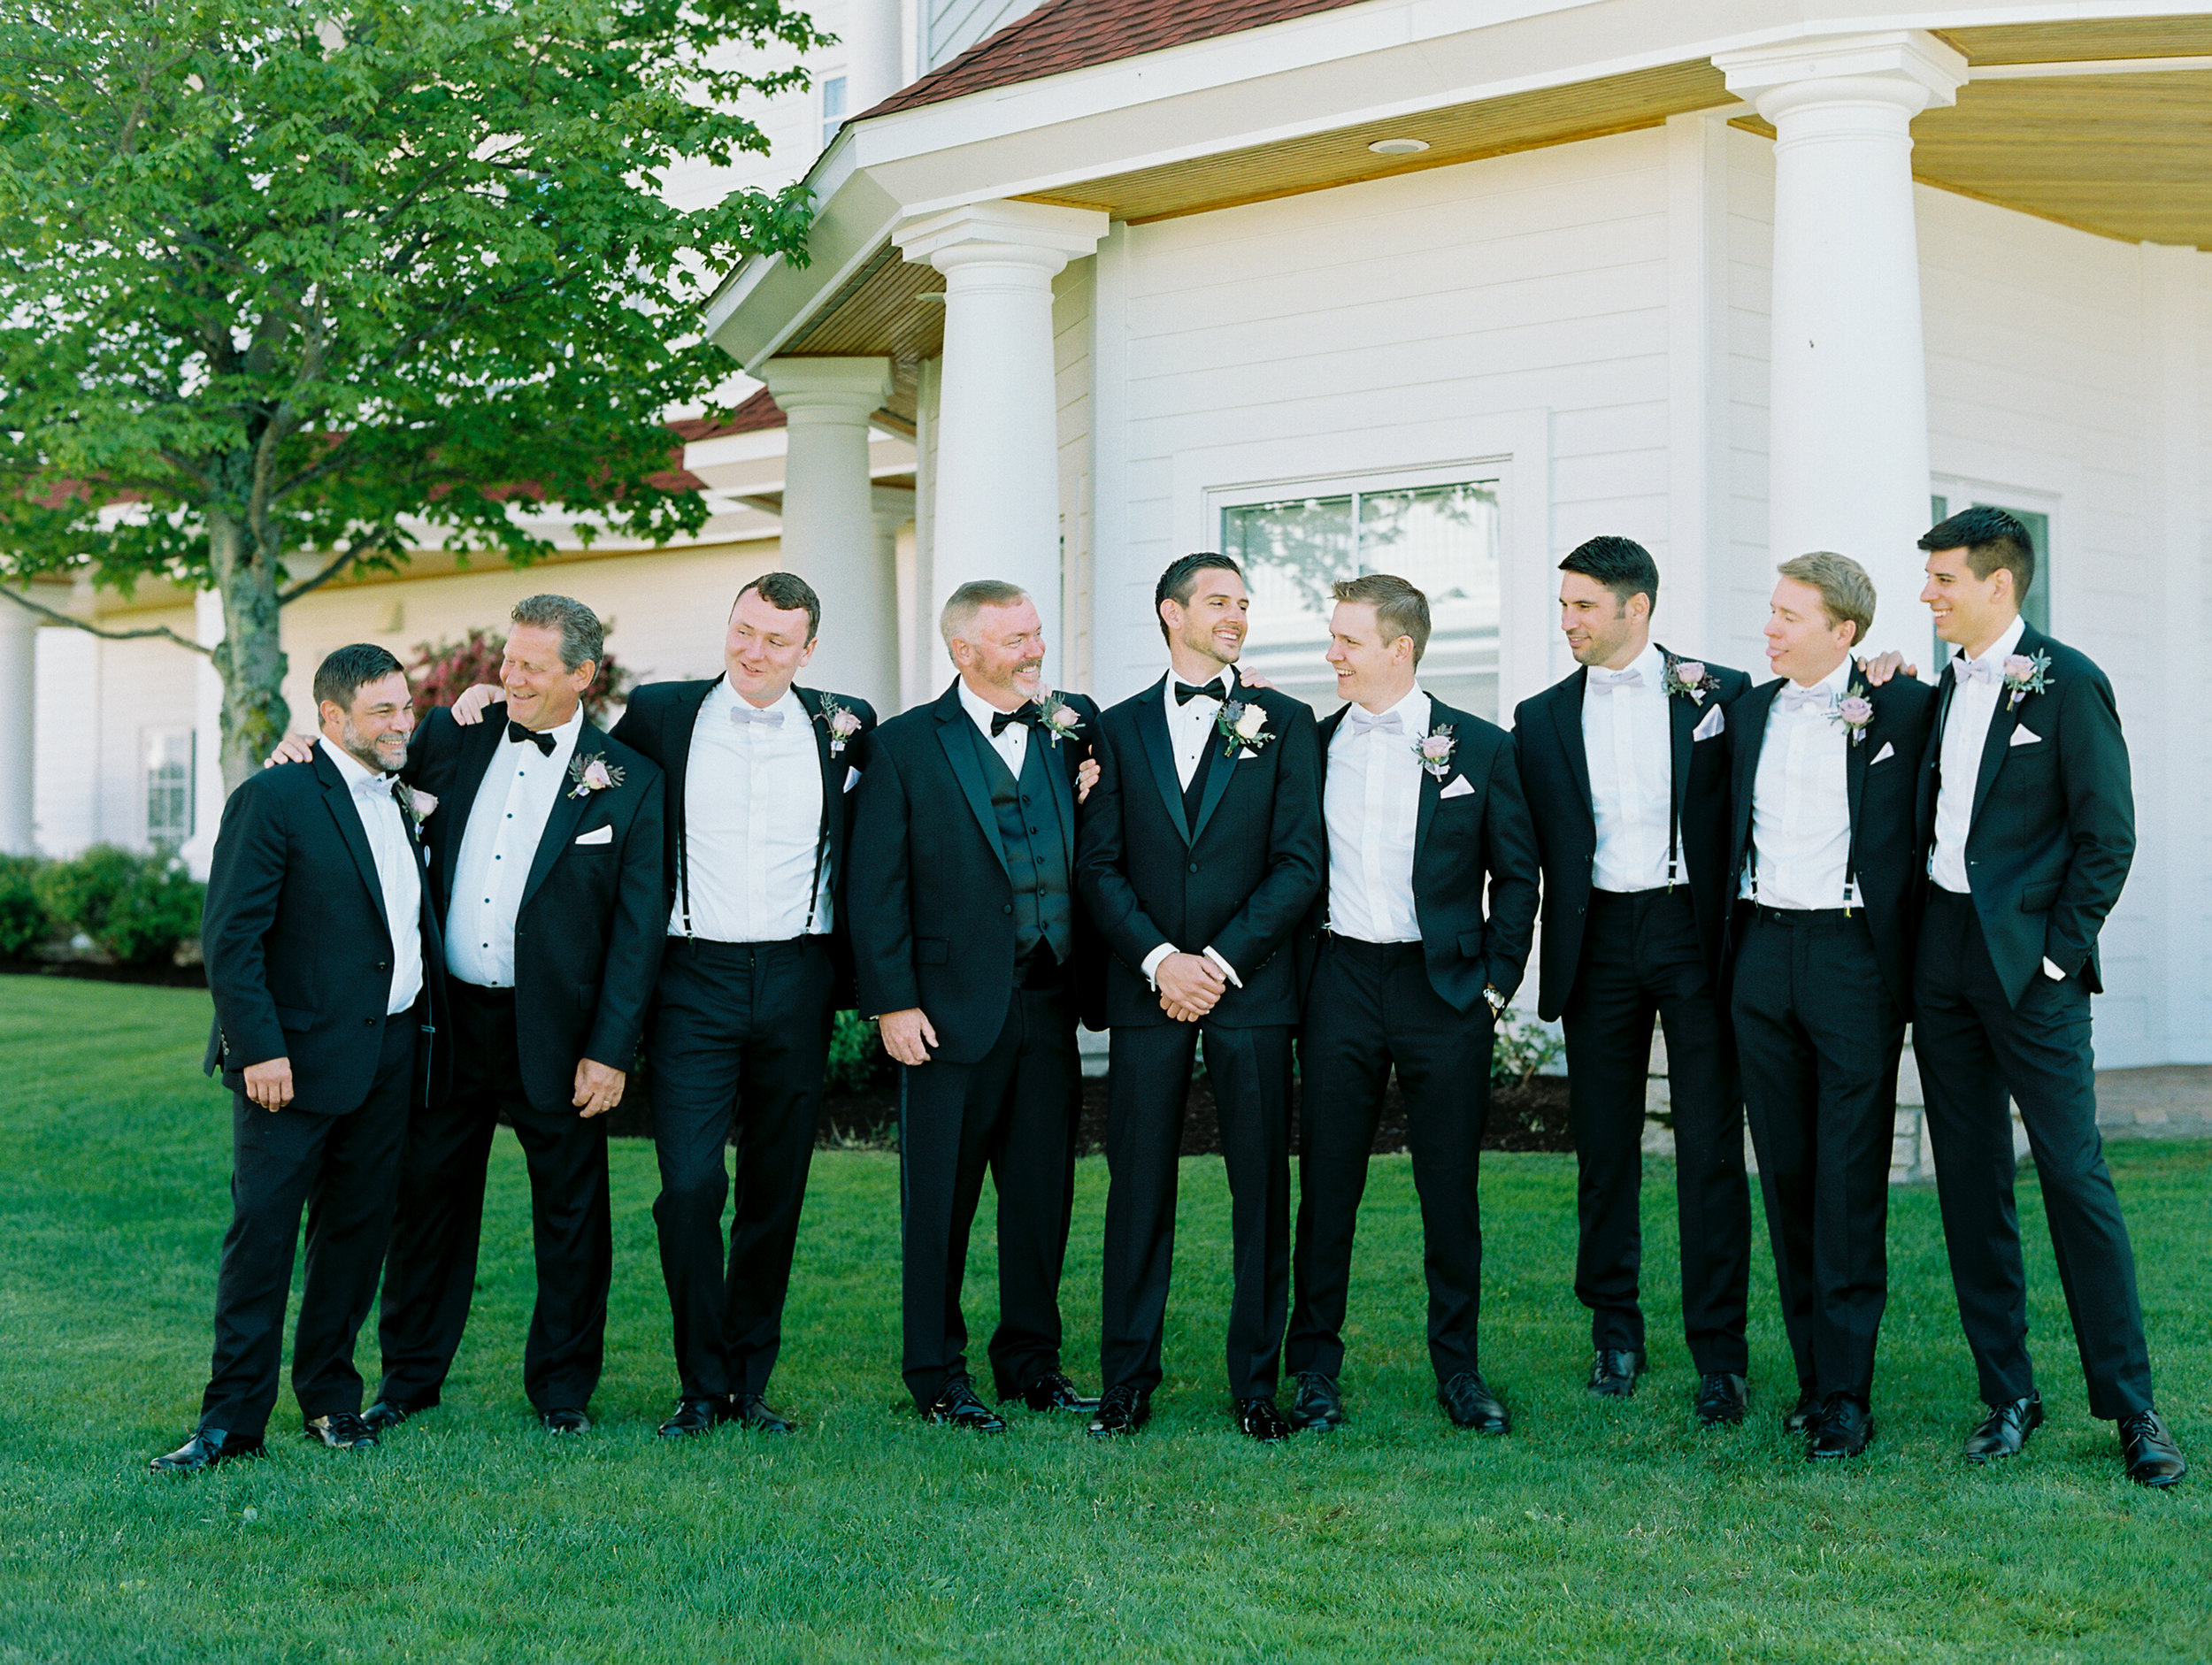 Noss+Wedding+Groom+Groomsmen-32.jpg